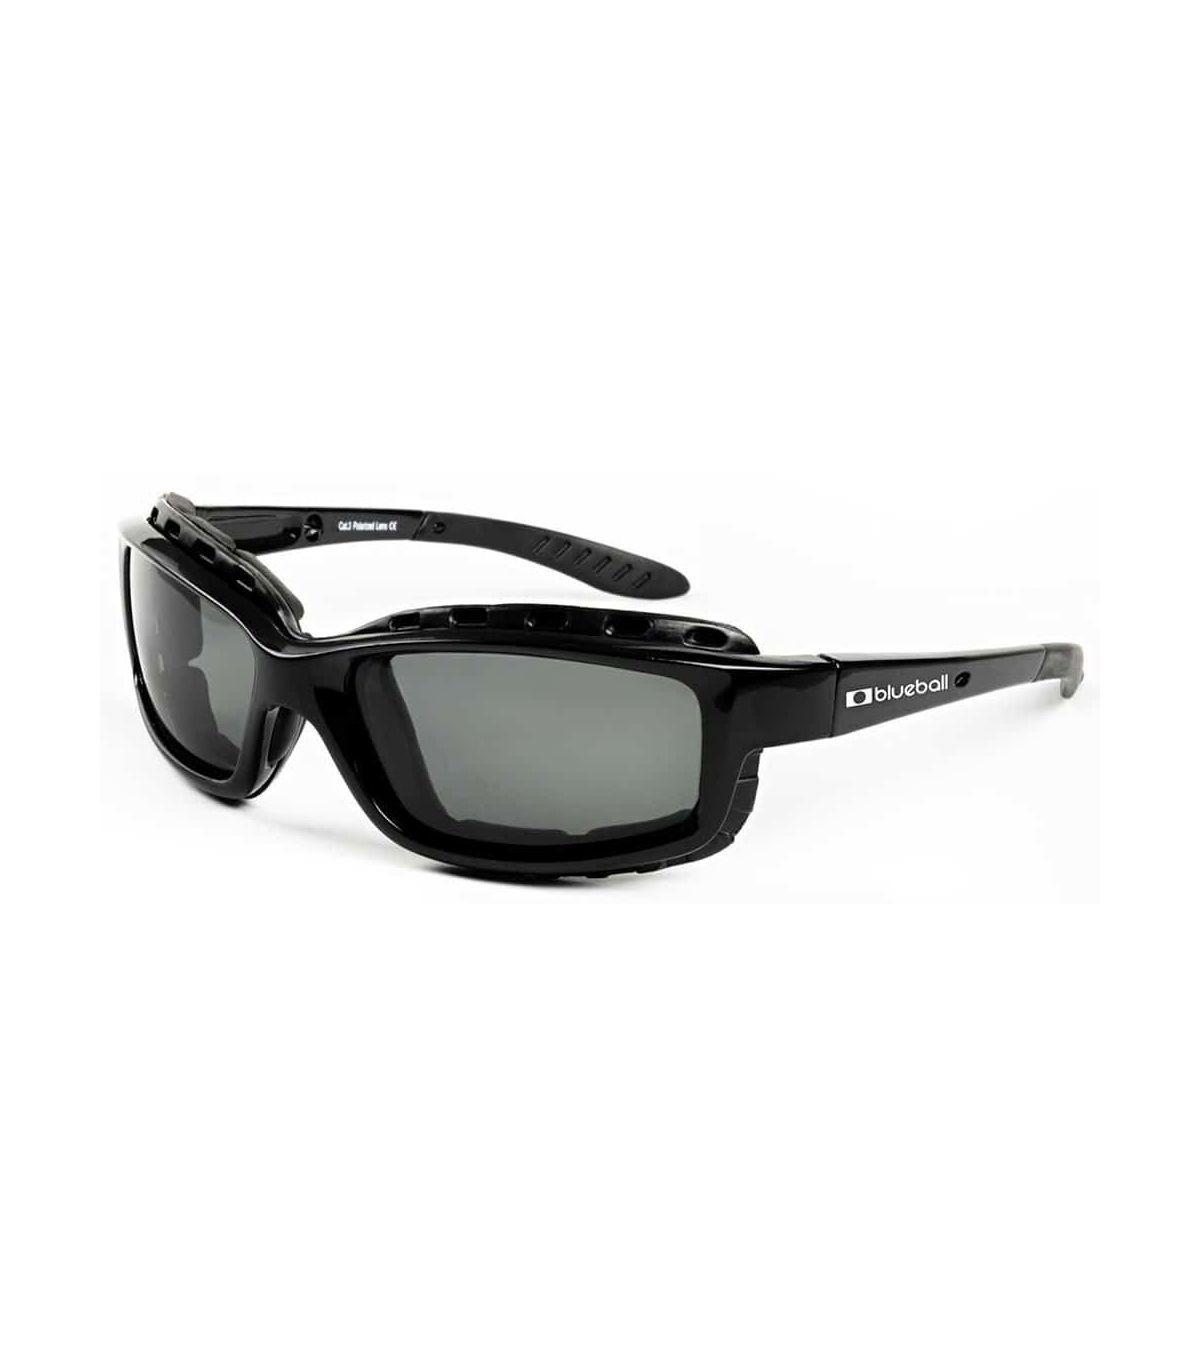 Blueball Saint Malo Shiny Black / Smoke Blueball Gafas de Sol Sport Gafas de Sol Color: negro